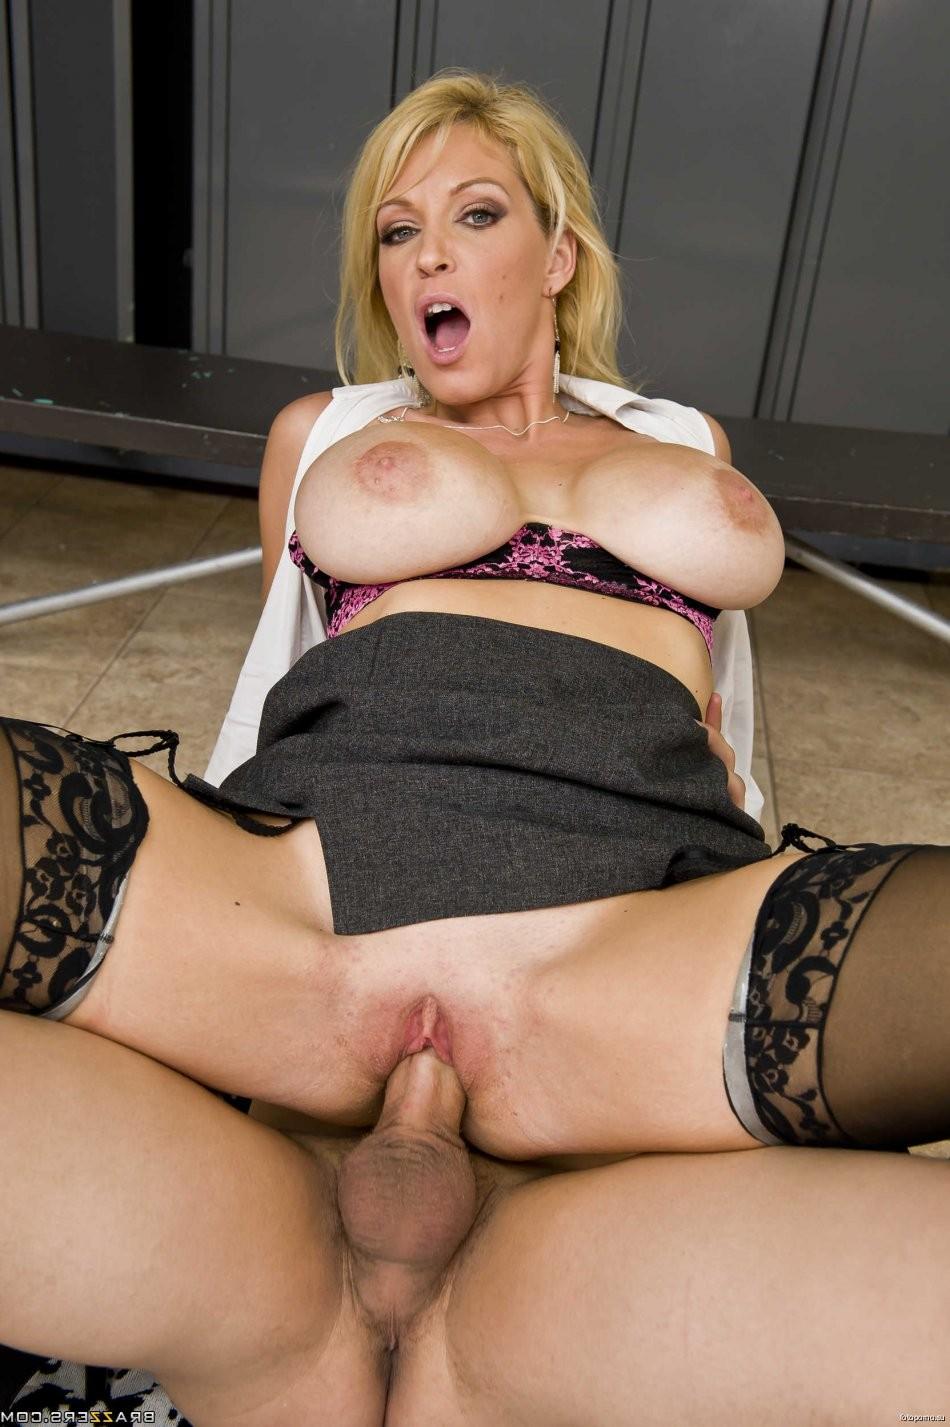 bras big boobs – Erotic